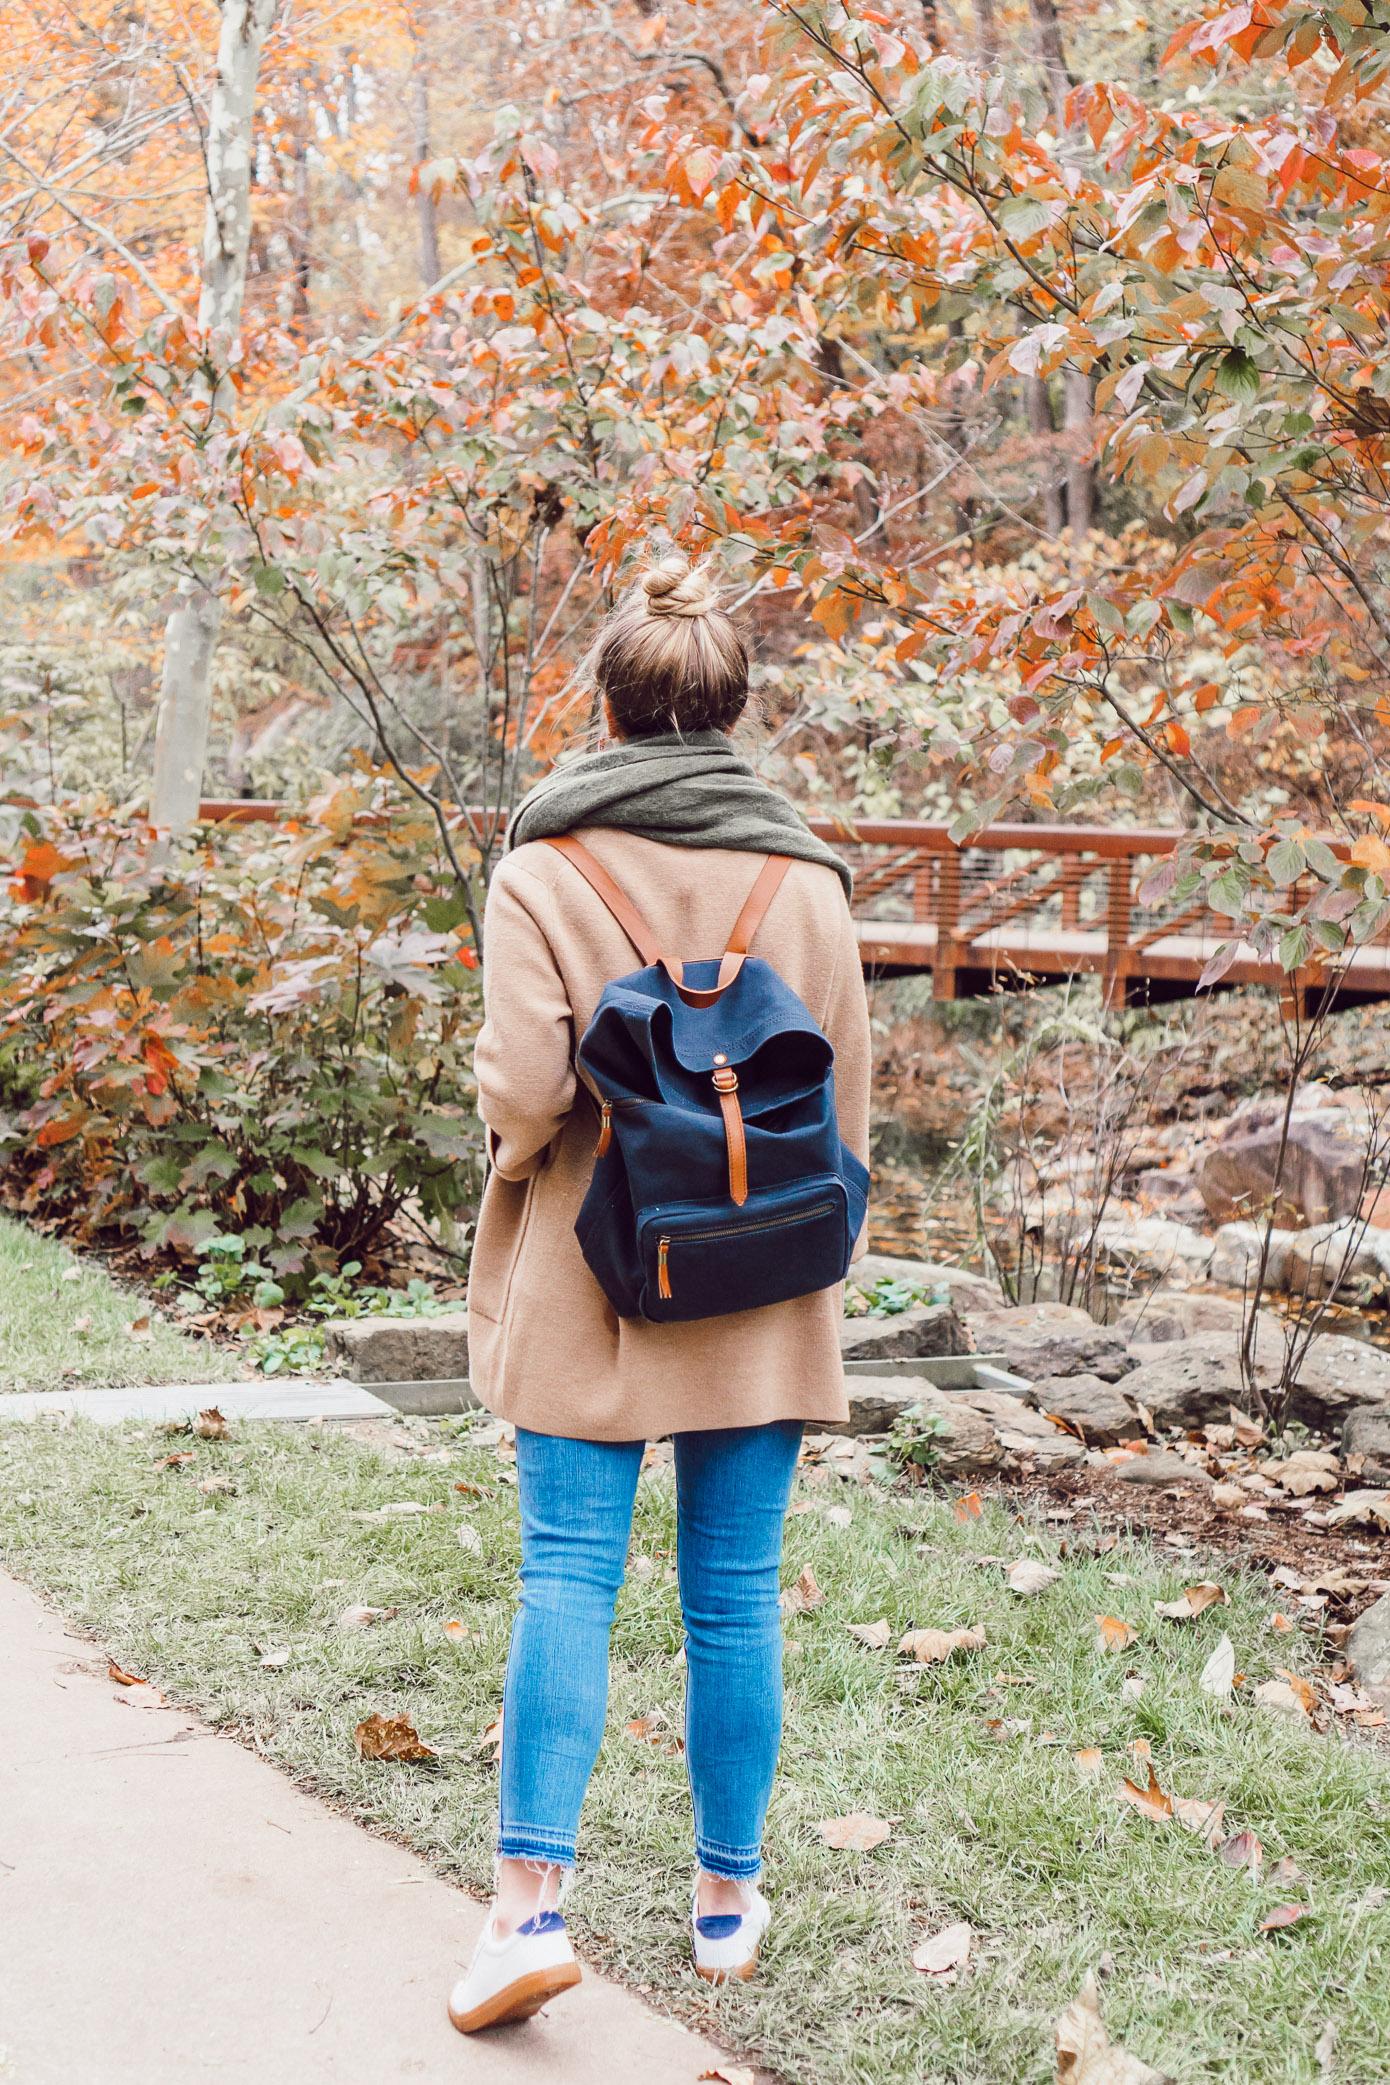 Frank Lloyd House at Crystal Bridges | Bentonville Arkansas Travel Diary featured on Louella Reese | Unexpected Long Weekend Getaway